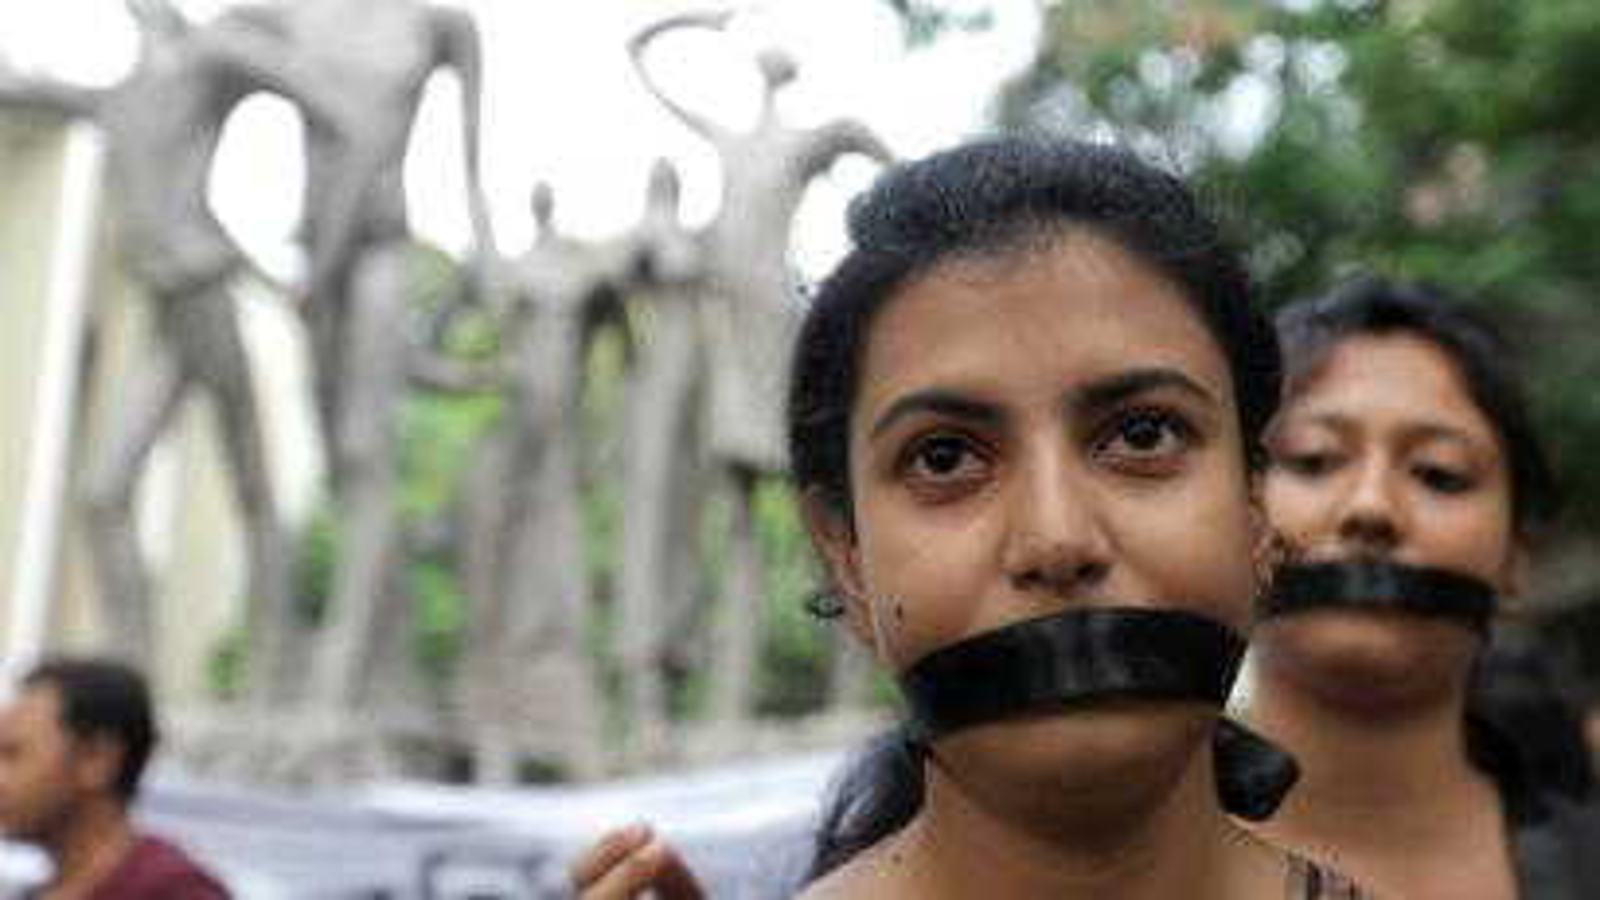 Women-JNU-India-University-Rohit Vemula-Hyderabad-protest march-Kanhaiya